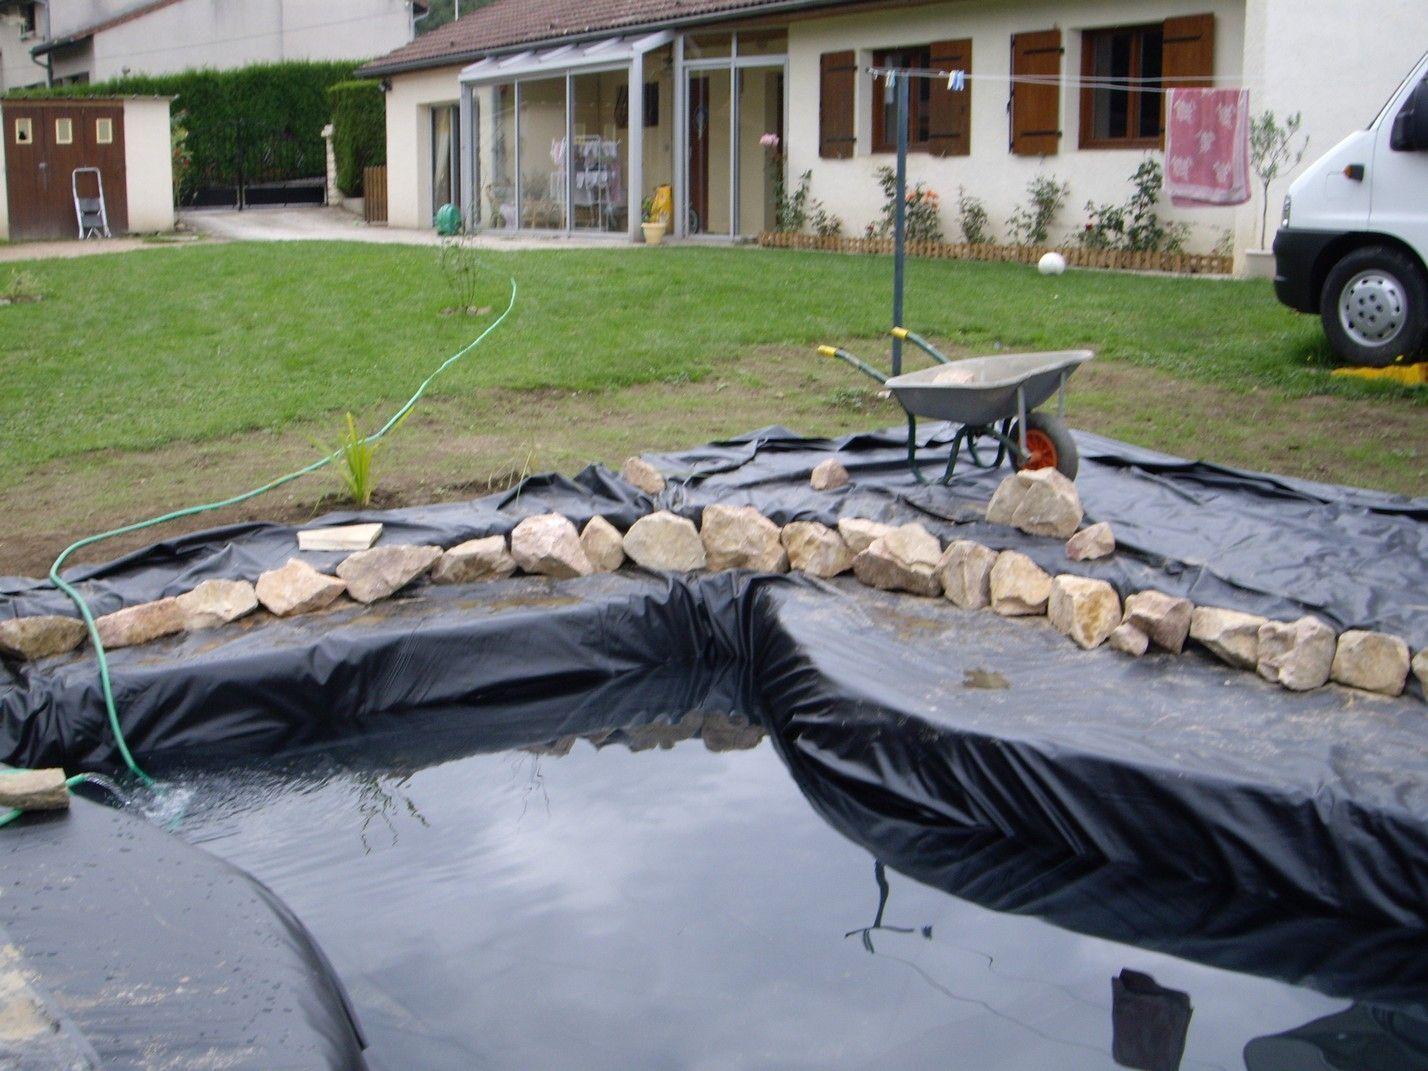 Stunning bassin de jardin cacher la bache photos for Bache pour bassin de jardin